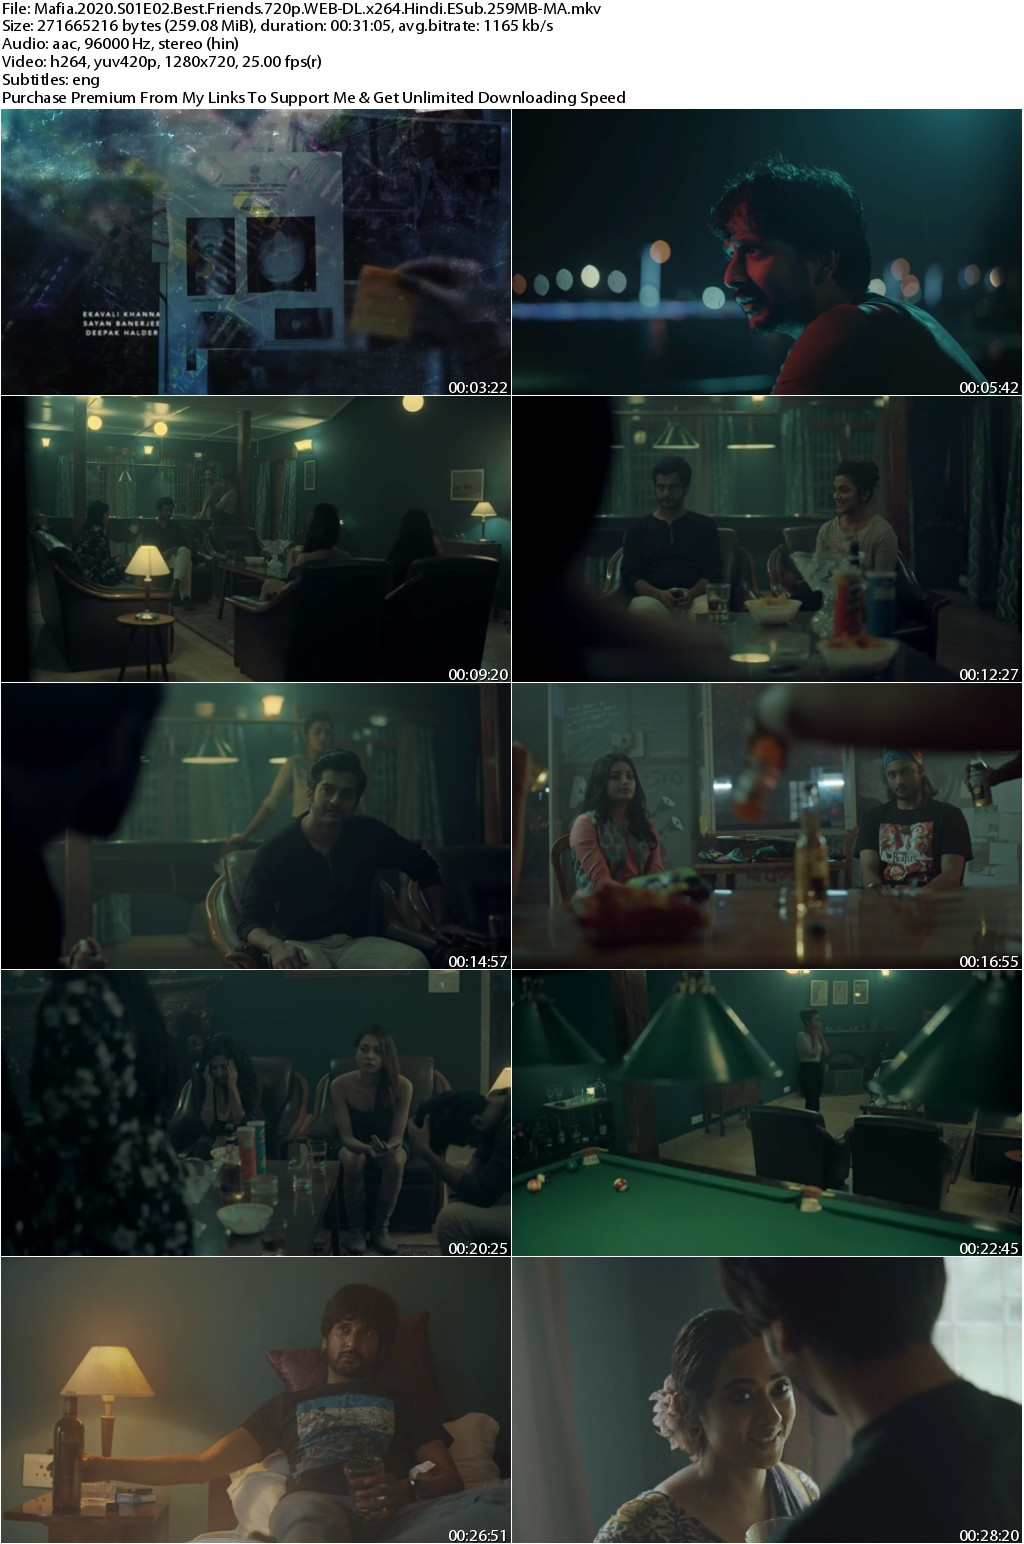 Mafia 2020 S01 Complete Hindi 720p WEB-DL x264 ESub 2GB-MA